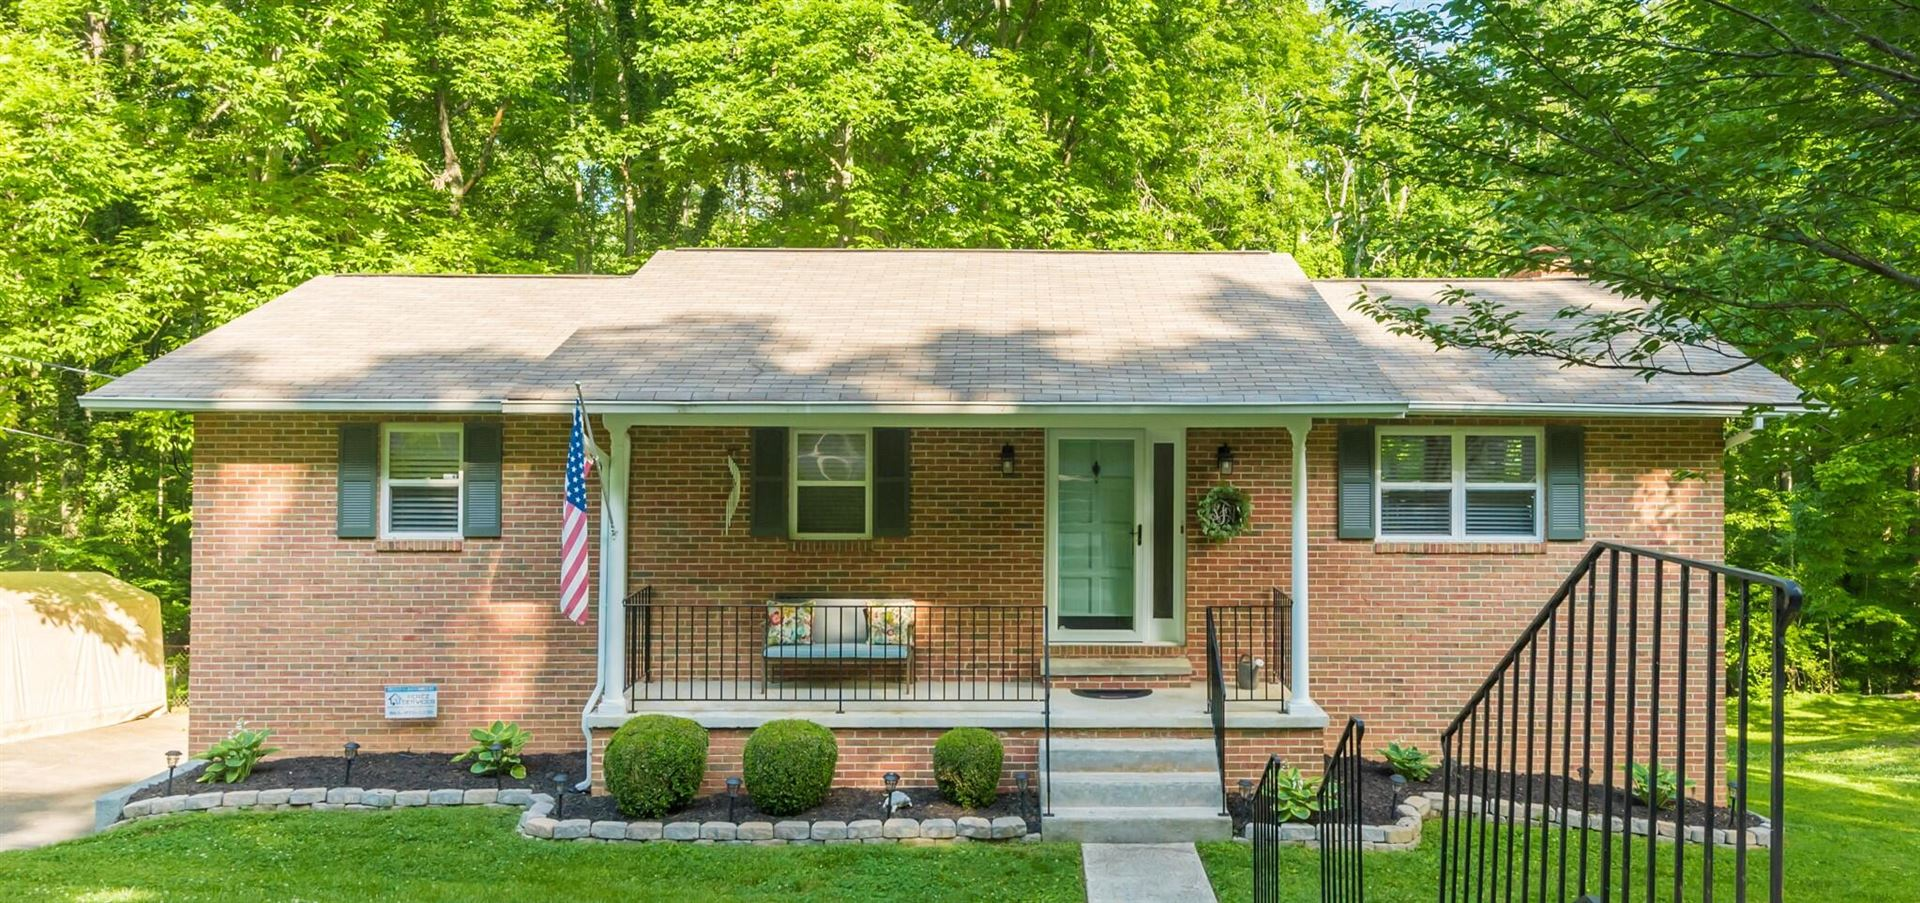 Photo of 103 Wedgewood Rd, Oak Ridge, TN 37830 (MLS # 1154515)